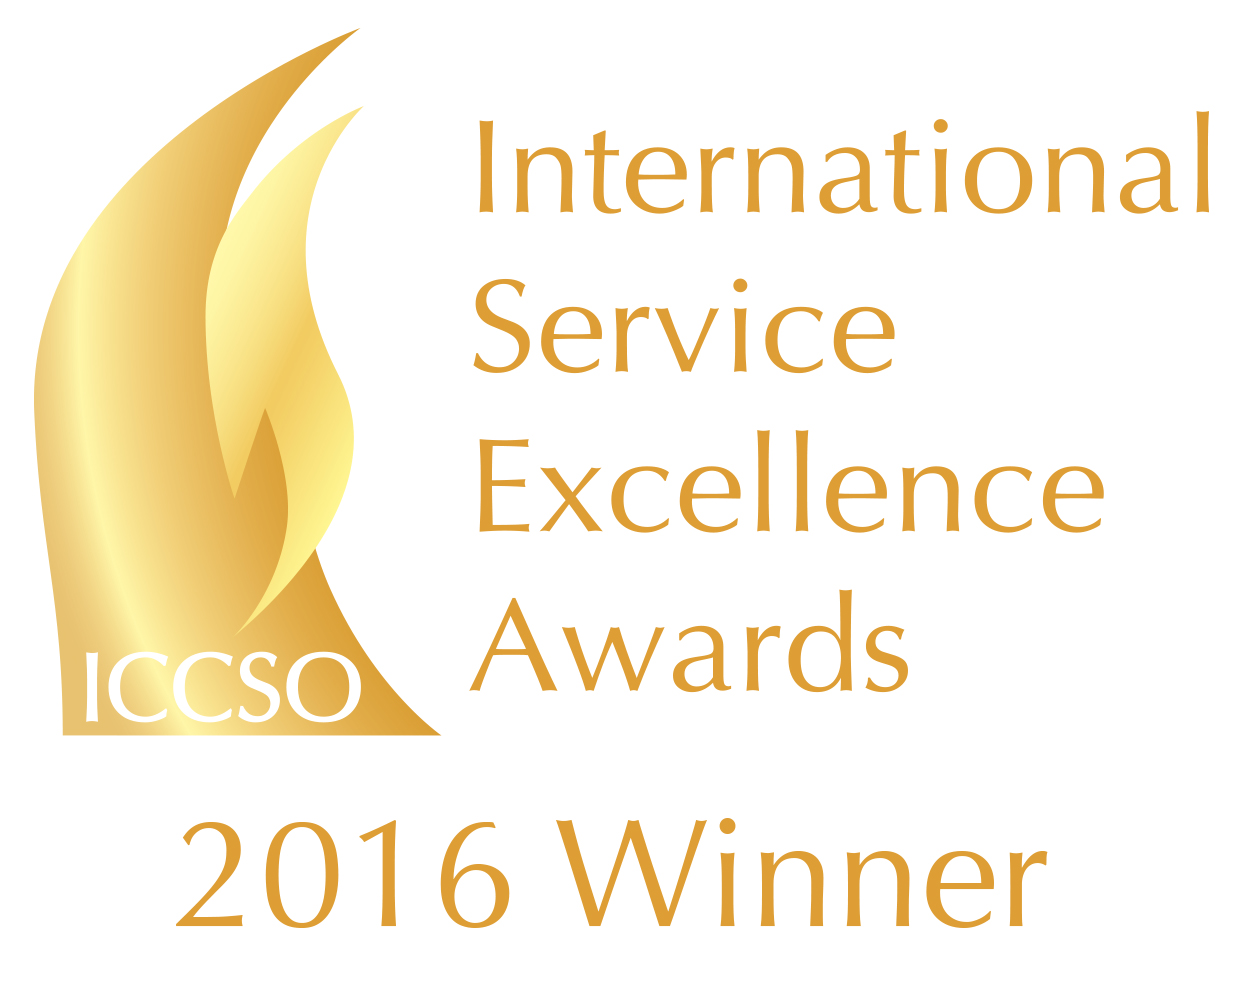 ICCSO font winner large.jpg